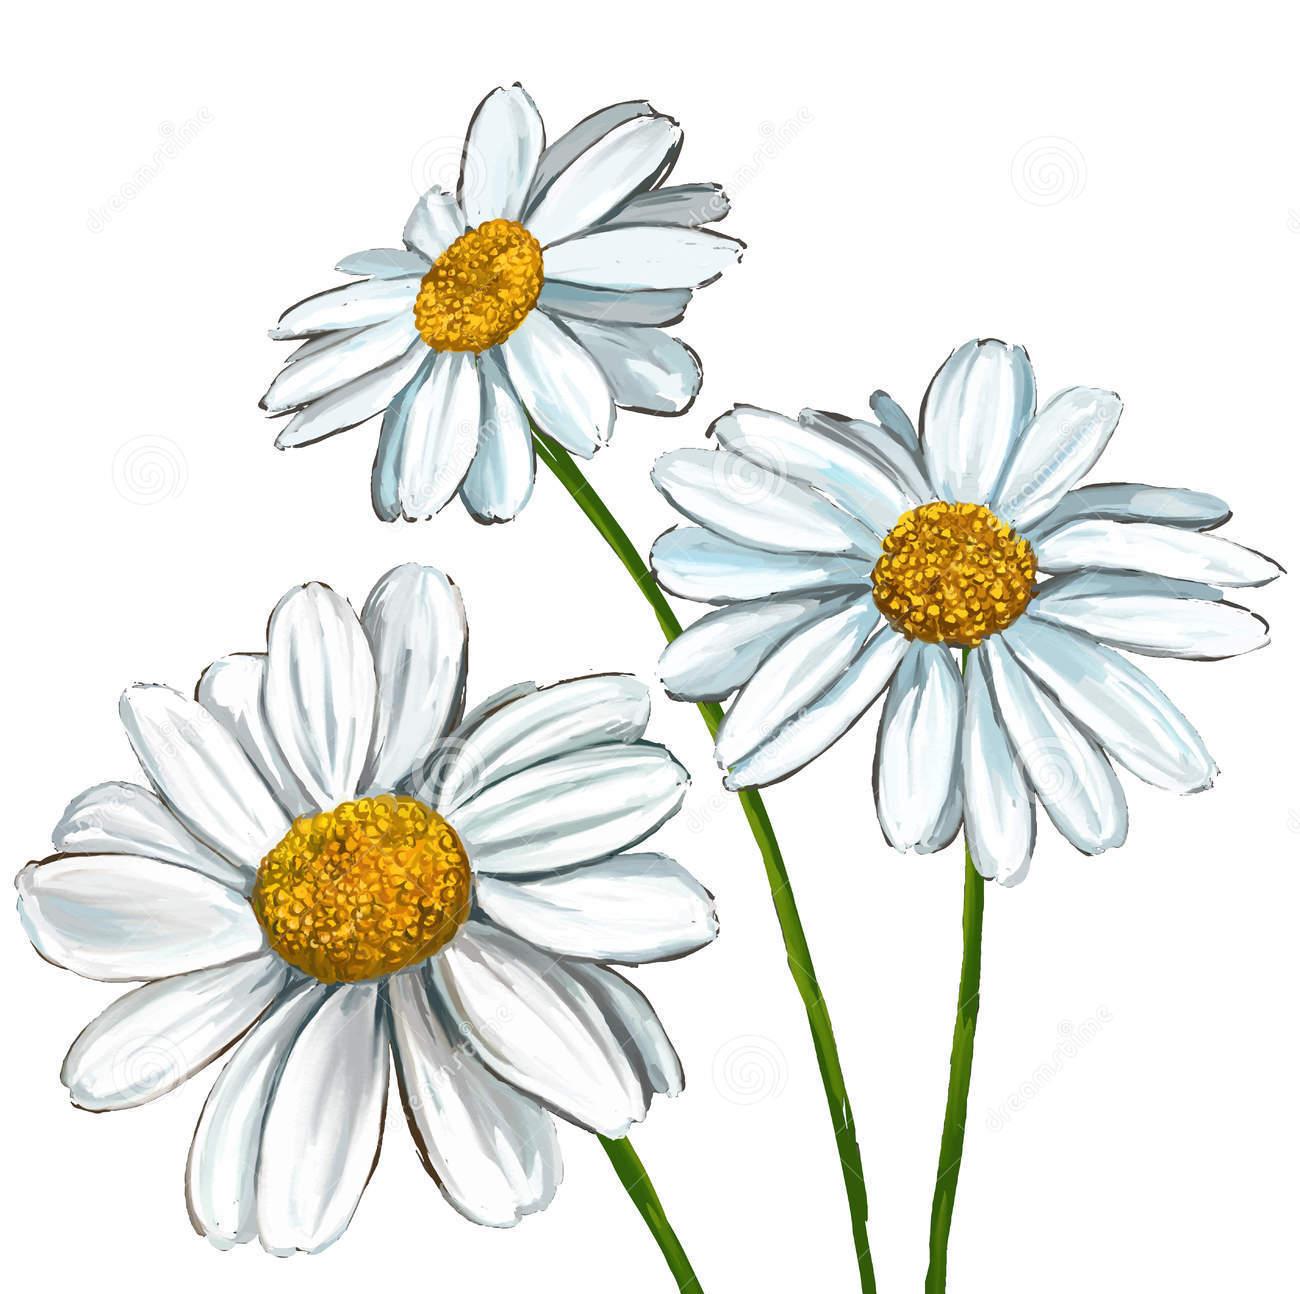 Sketch-of-Marguerite-Daisy